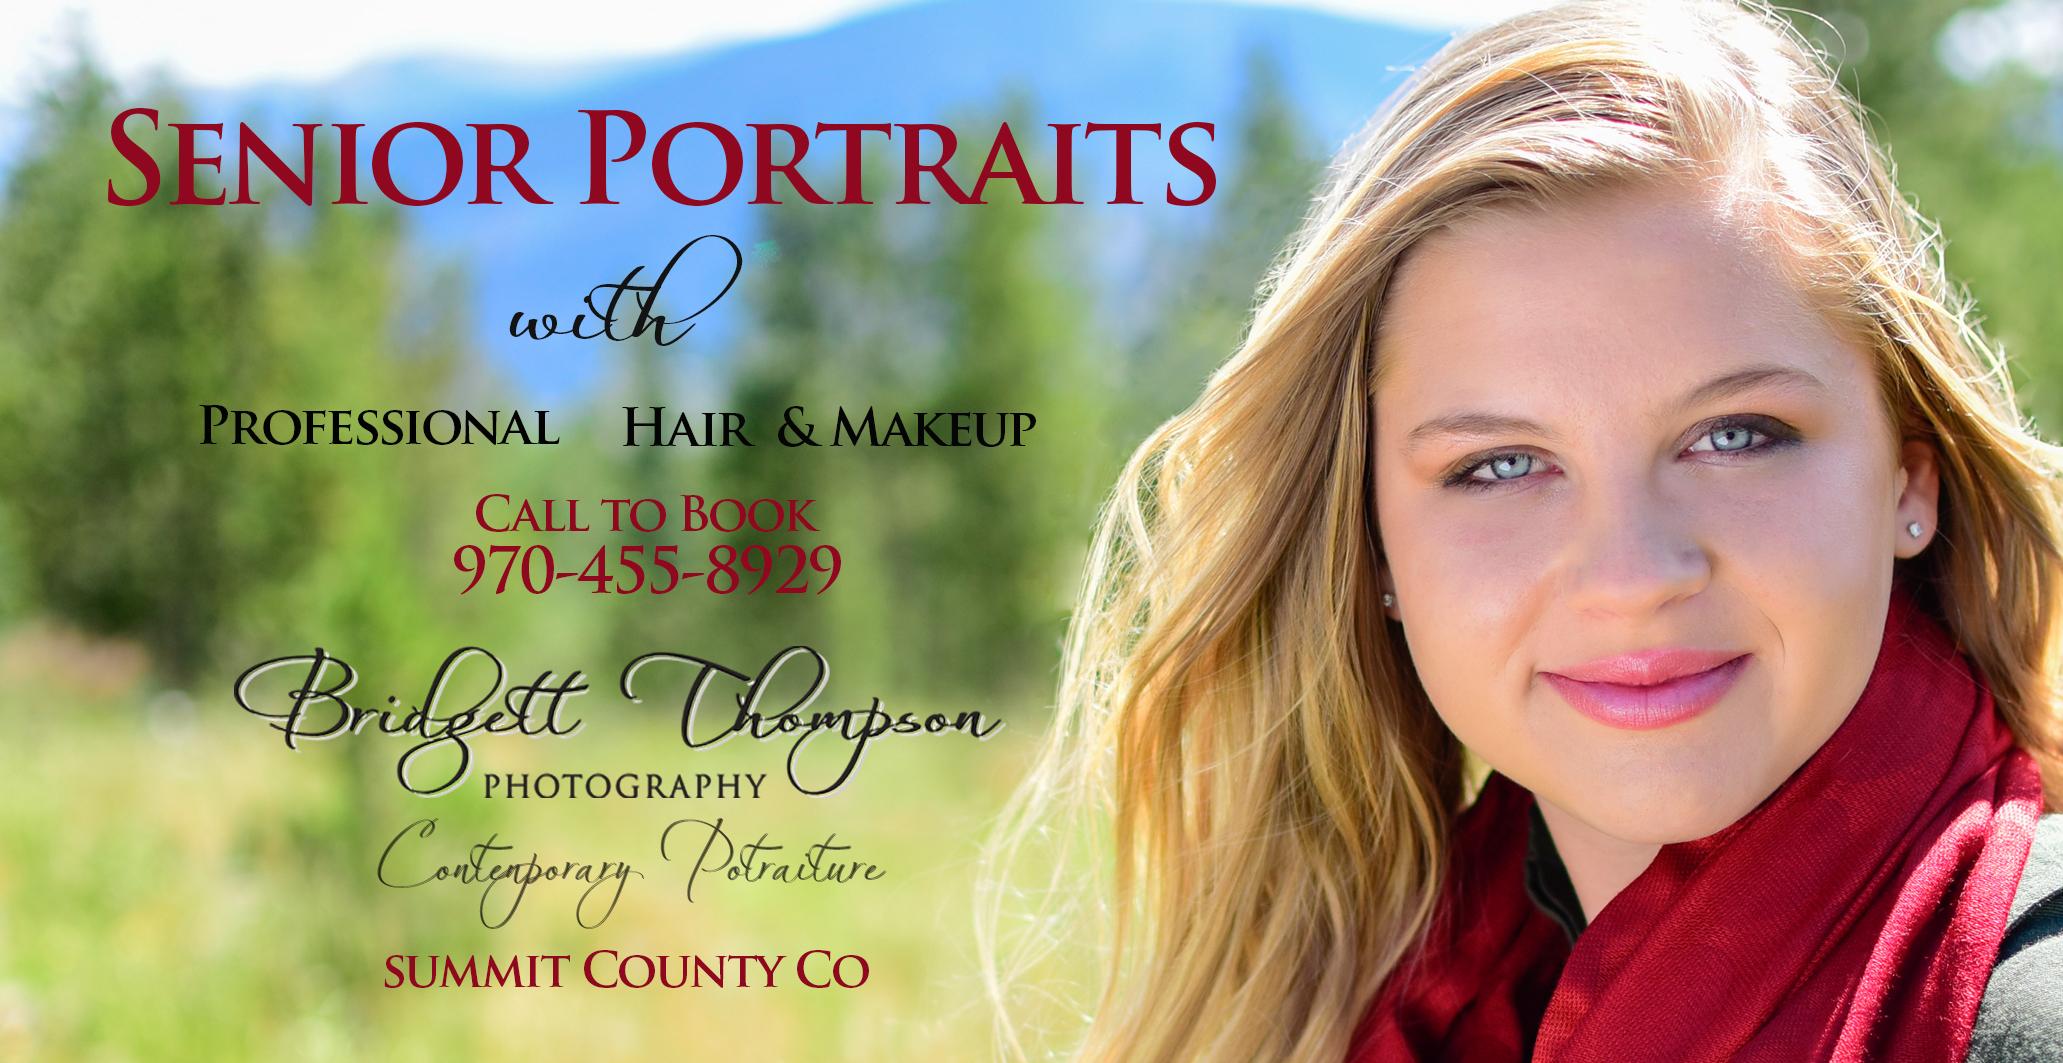 -Bridgett Thompson senior portrait card8x4 Flat Card 2 copy.jpg